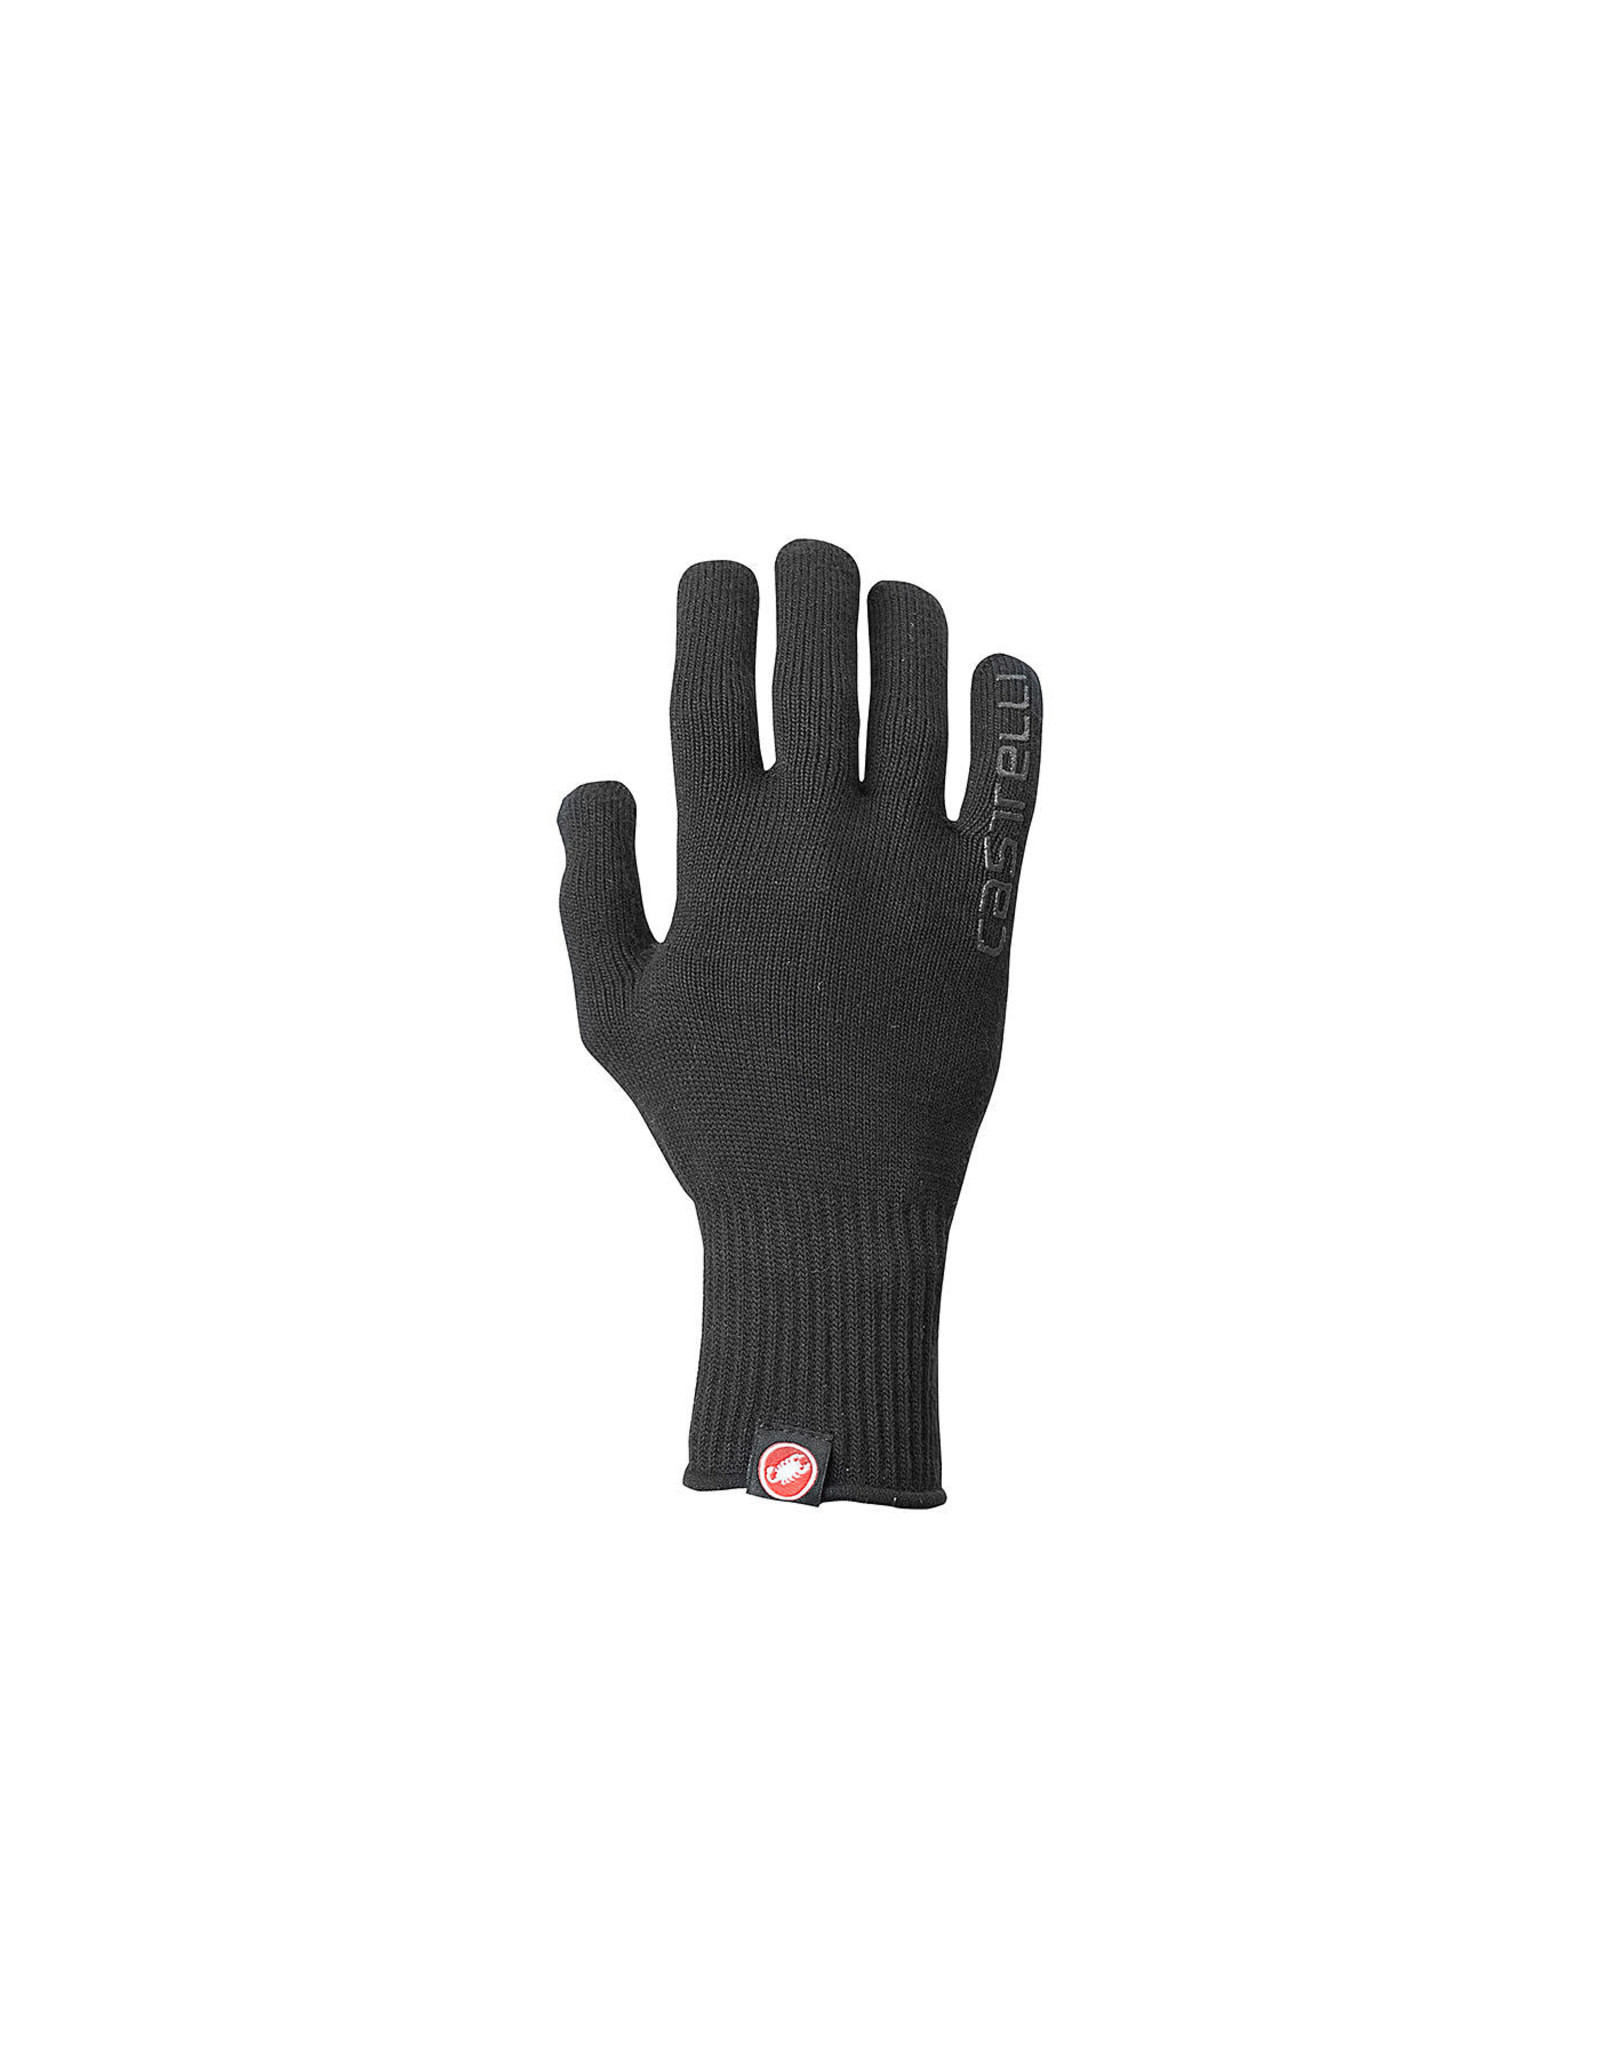 Castelli CASTELLI, Corridore Glove